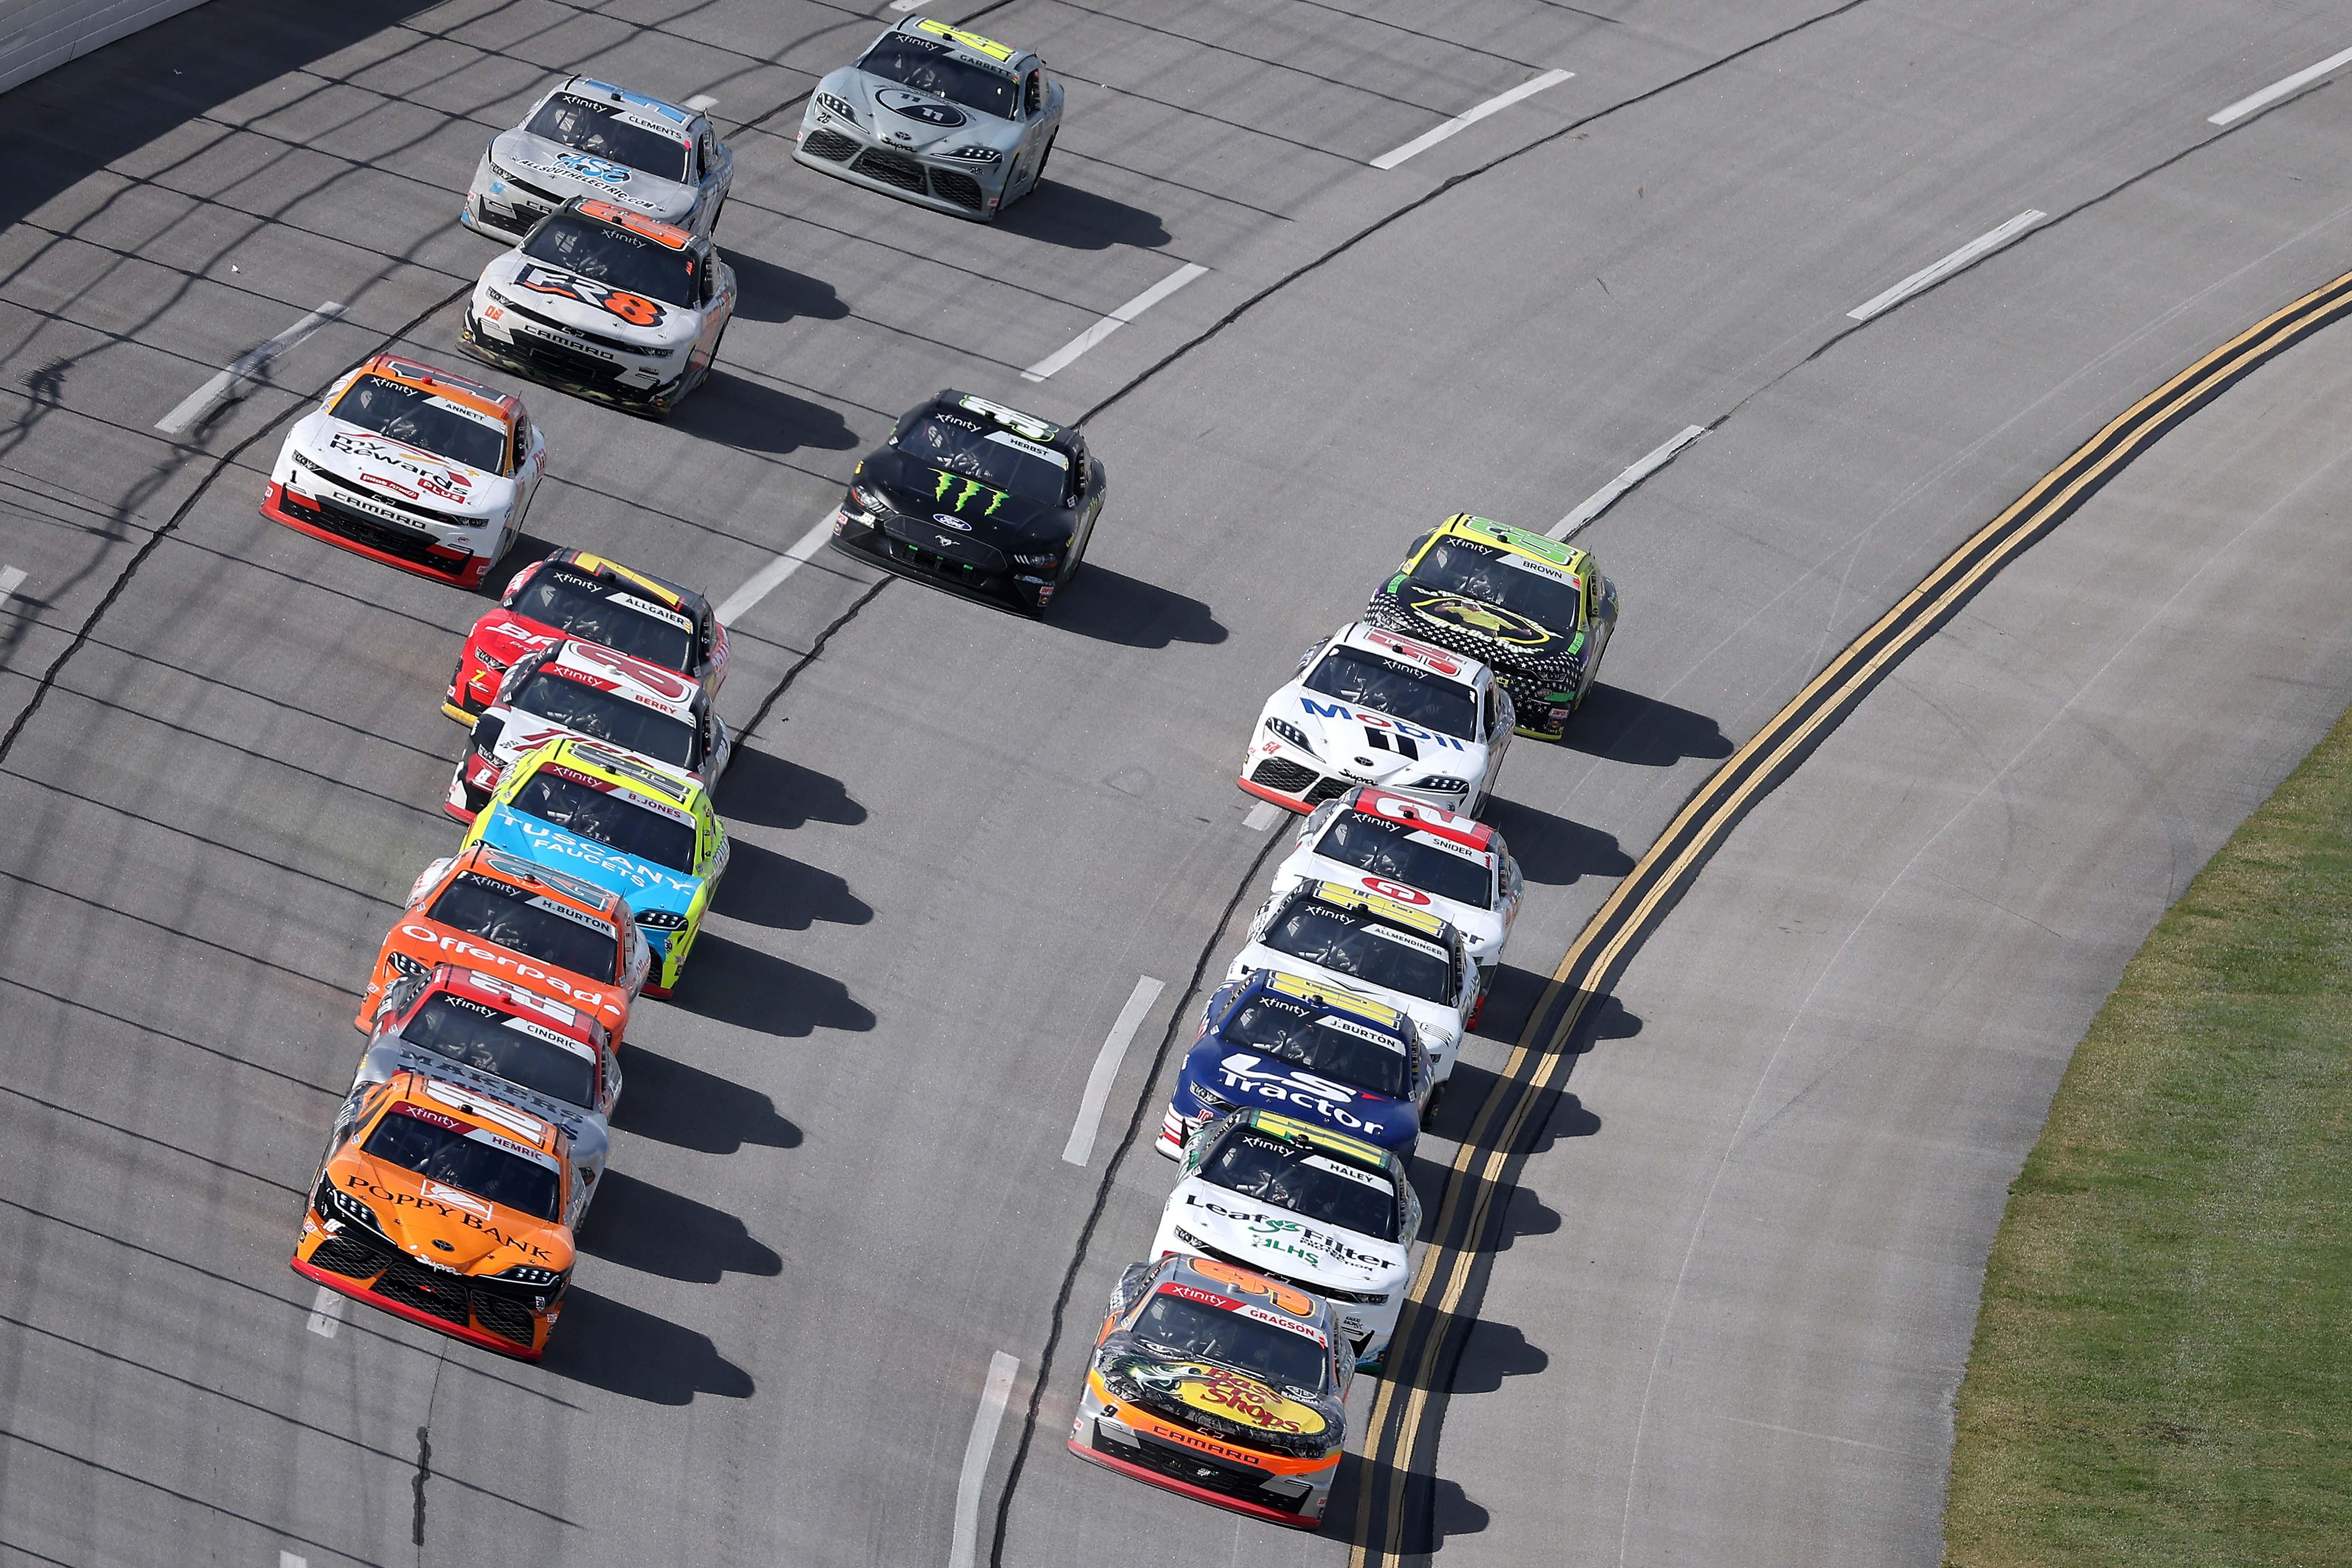 NASCAR Xfinity Series at Talladega Superspeedway